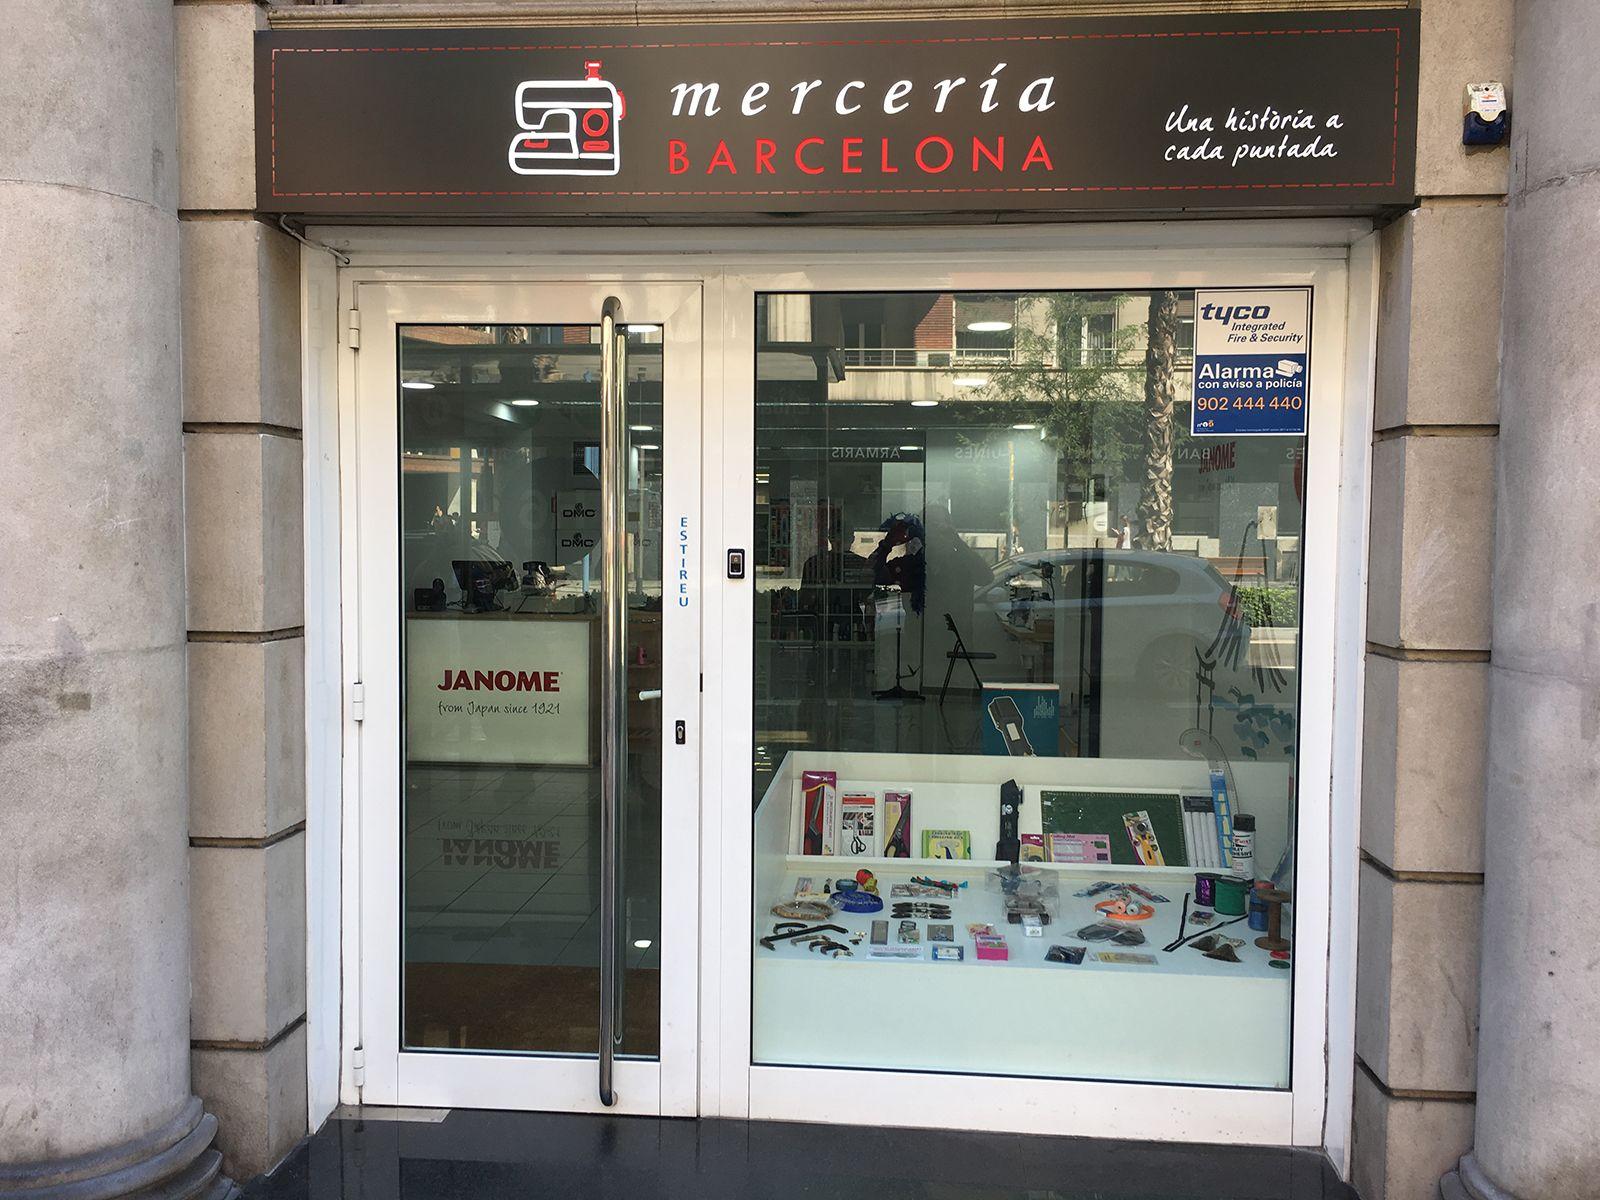 Máquinas de coser Janome - Mercería Barcelona